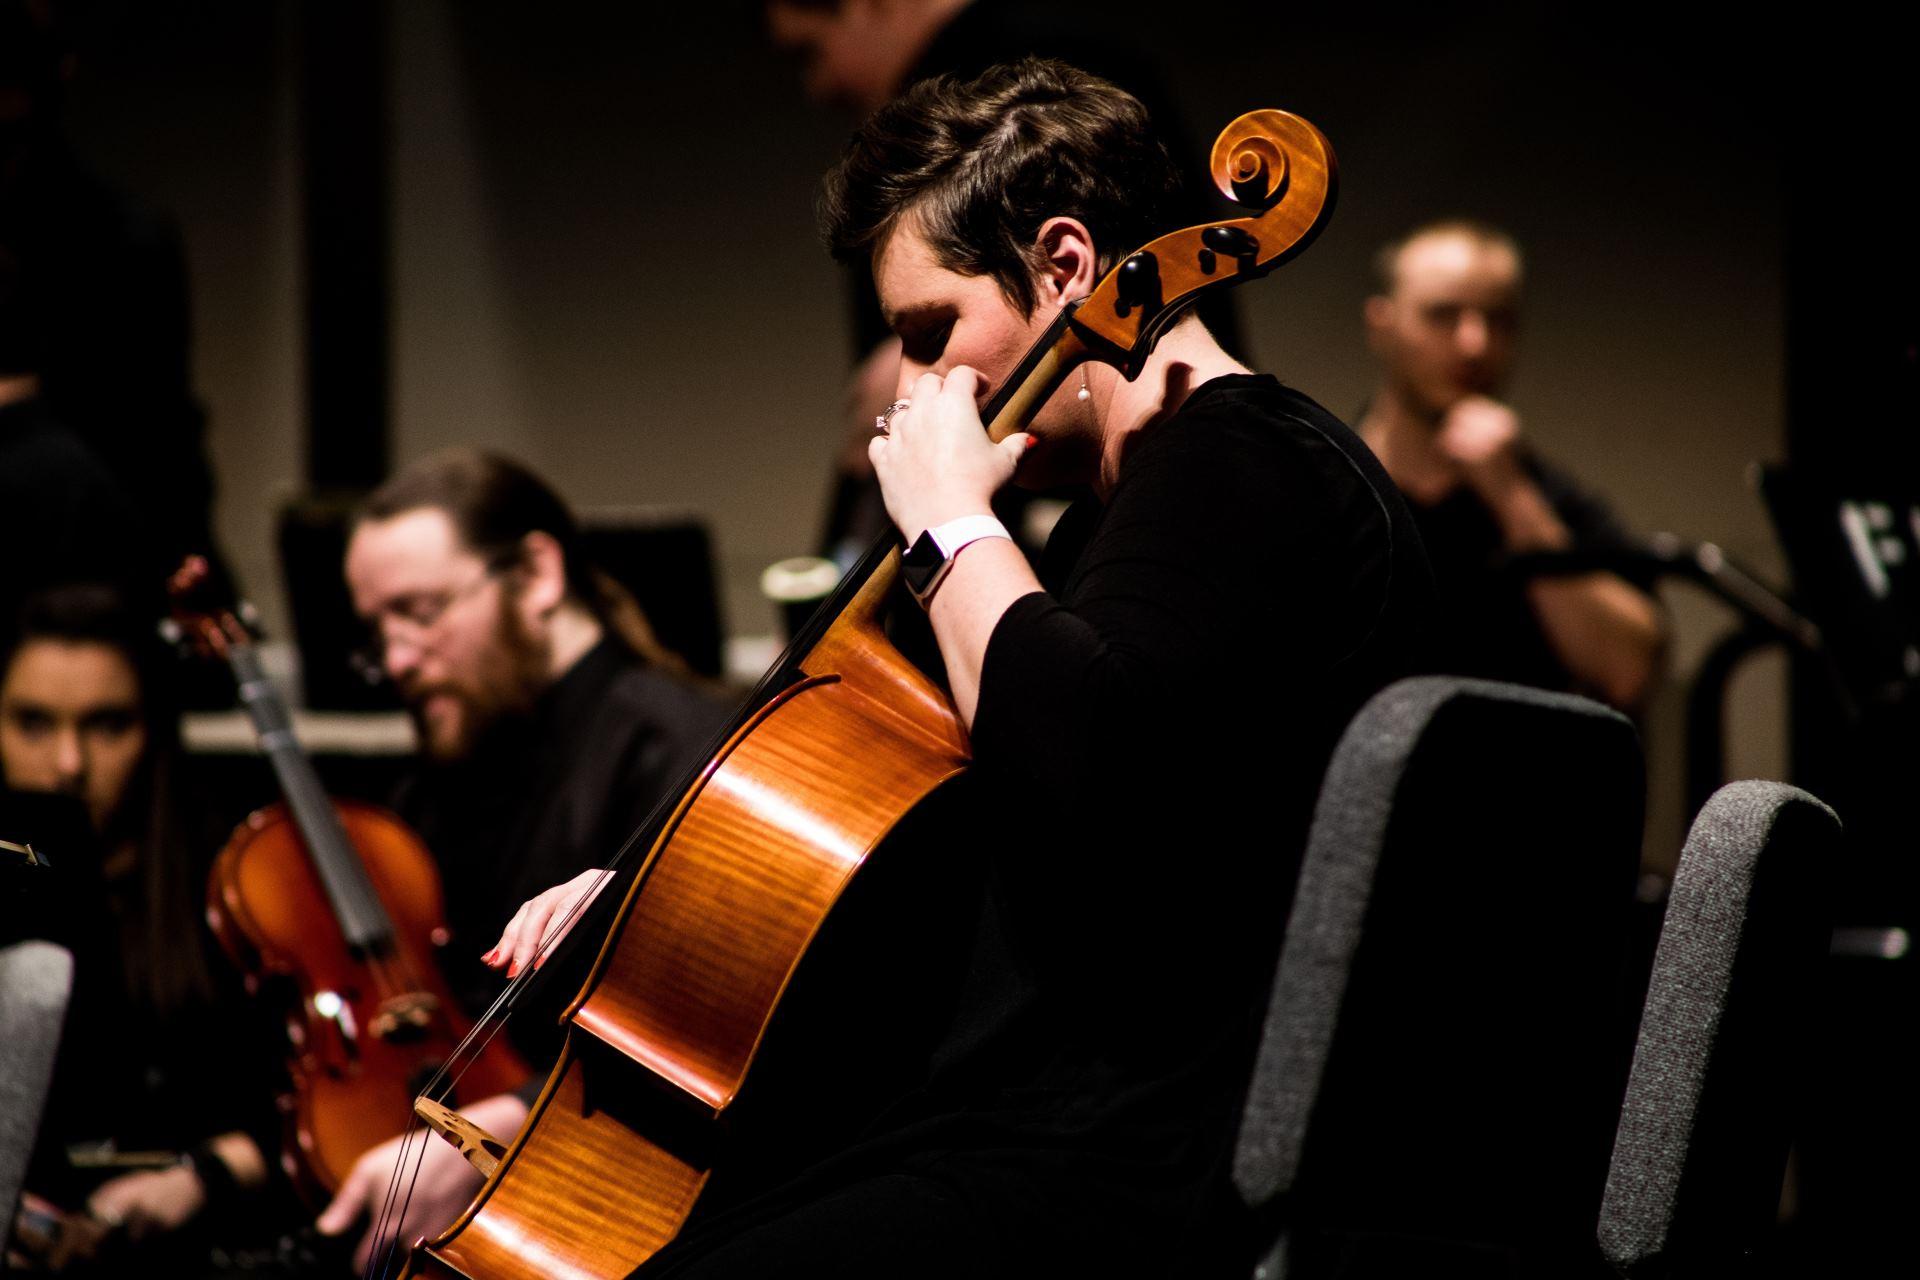 foto 1 orquesta carlos tercero